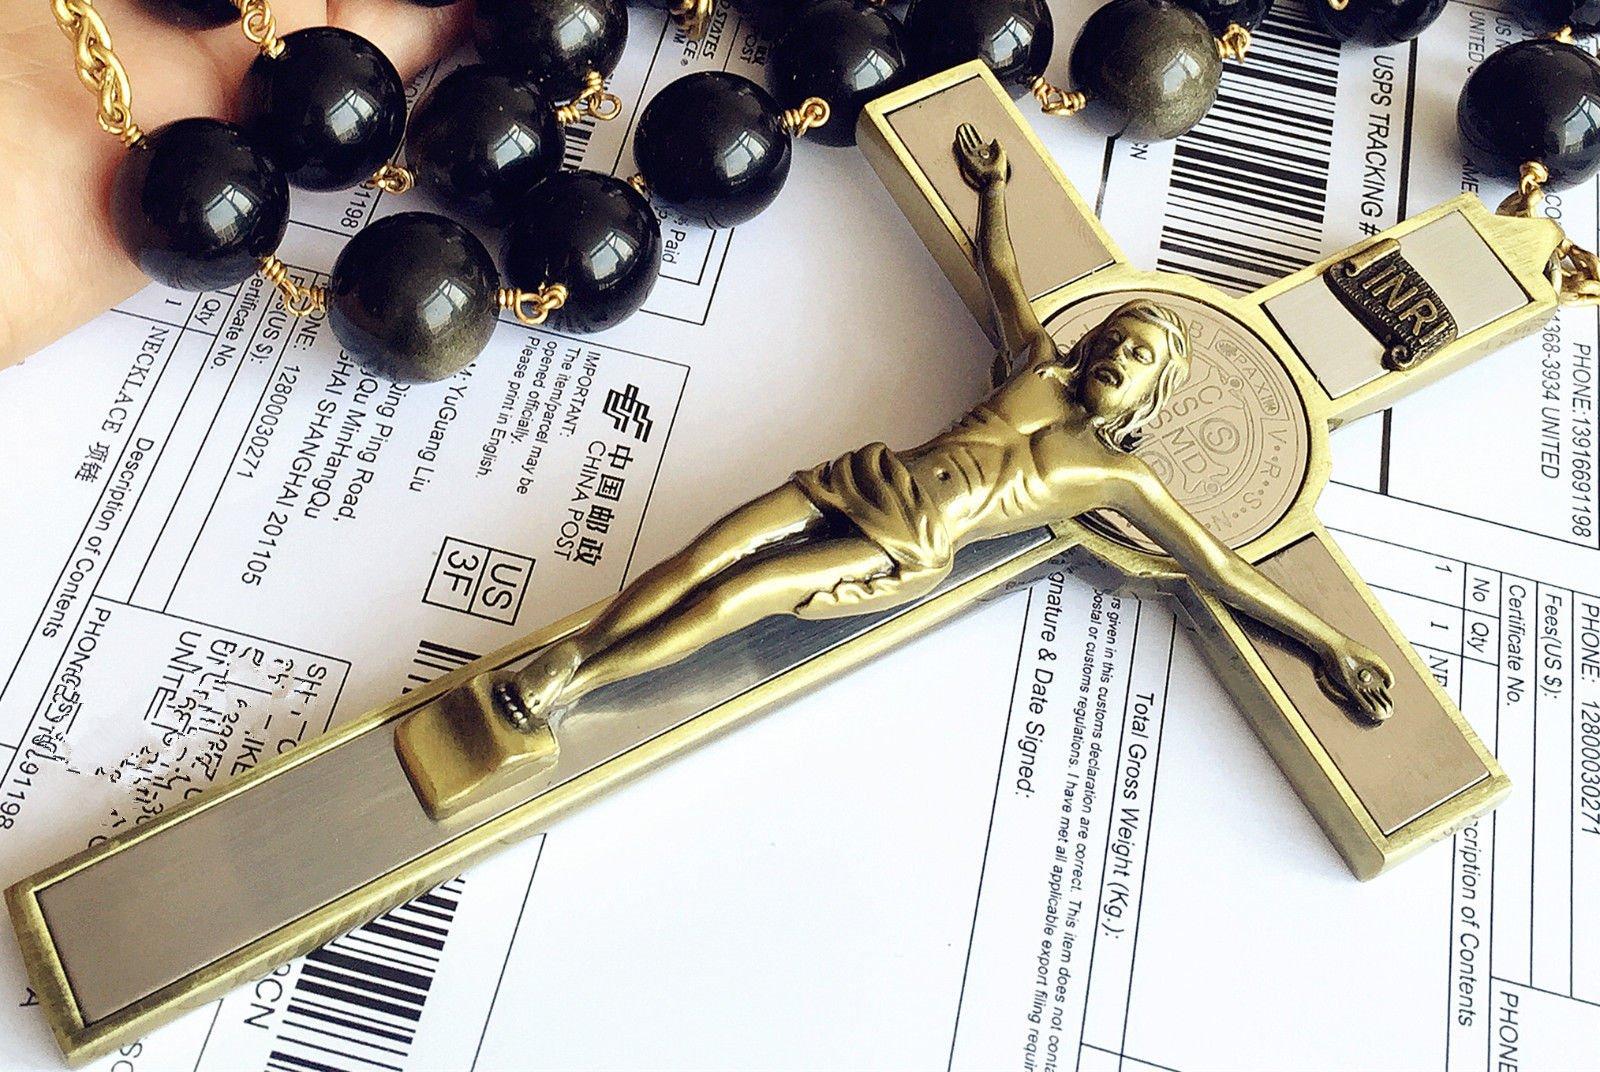 elegantmedical Handmade Large 20MM Black Gold Obsidian Bead Wall Rosary Cross St.Benedict Crucifix Catholic Gift Box by elegantmedical (Image #8)